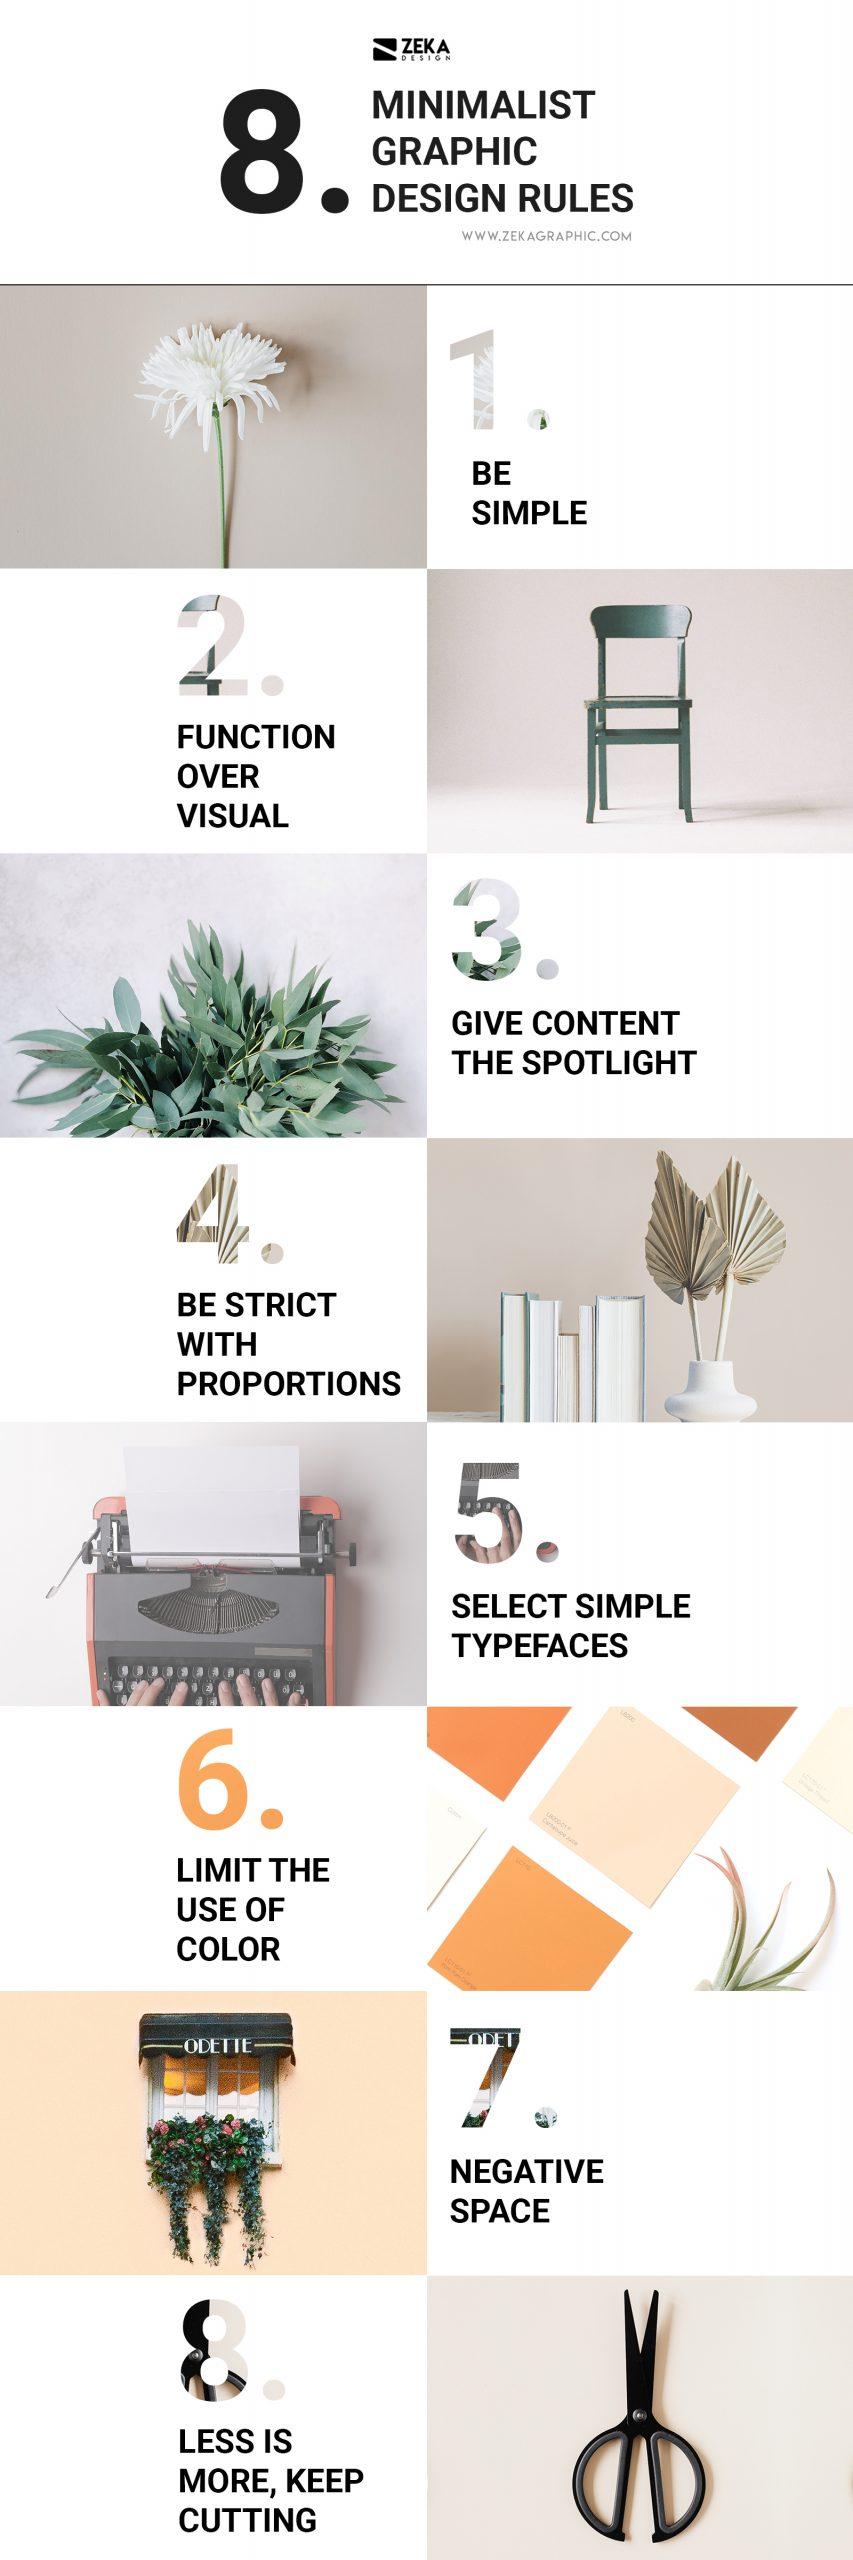 Minimalist Graphic Design Rules Infographic